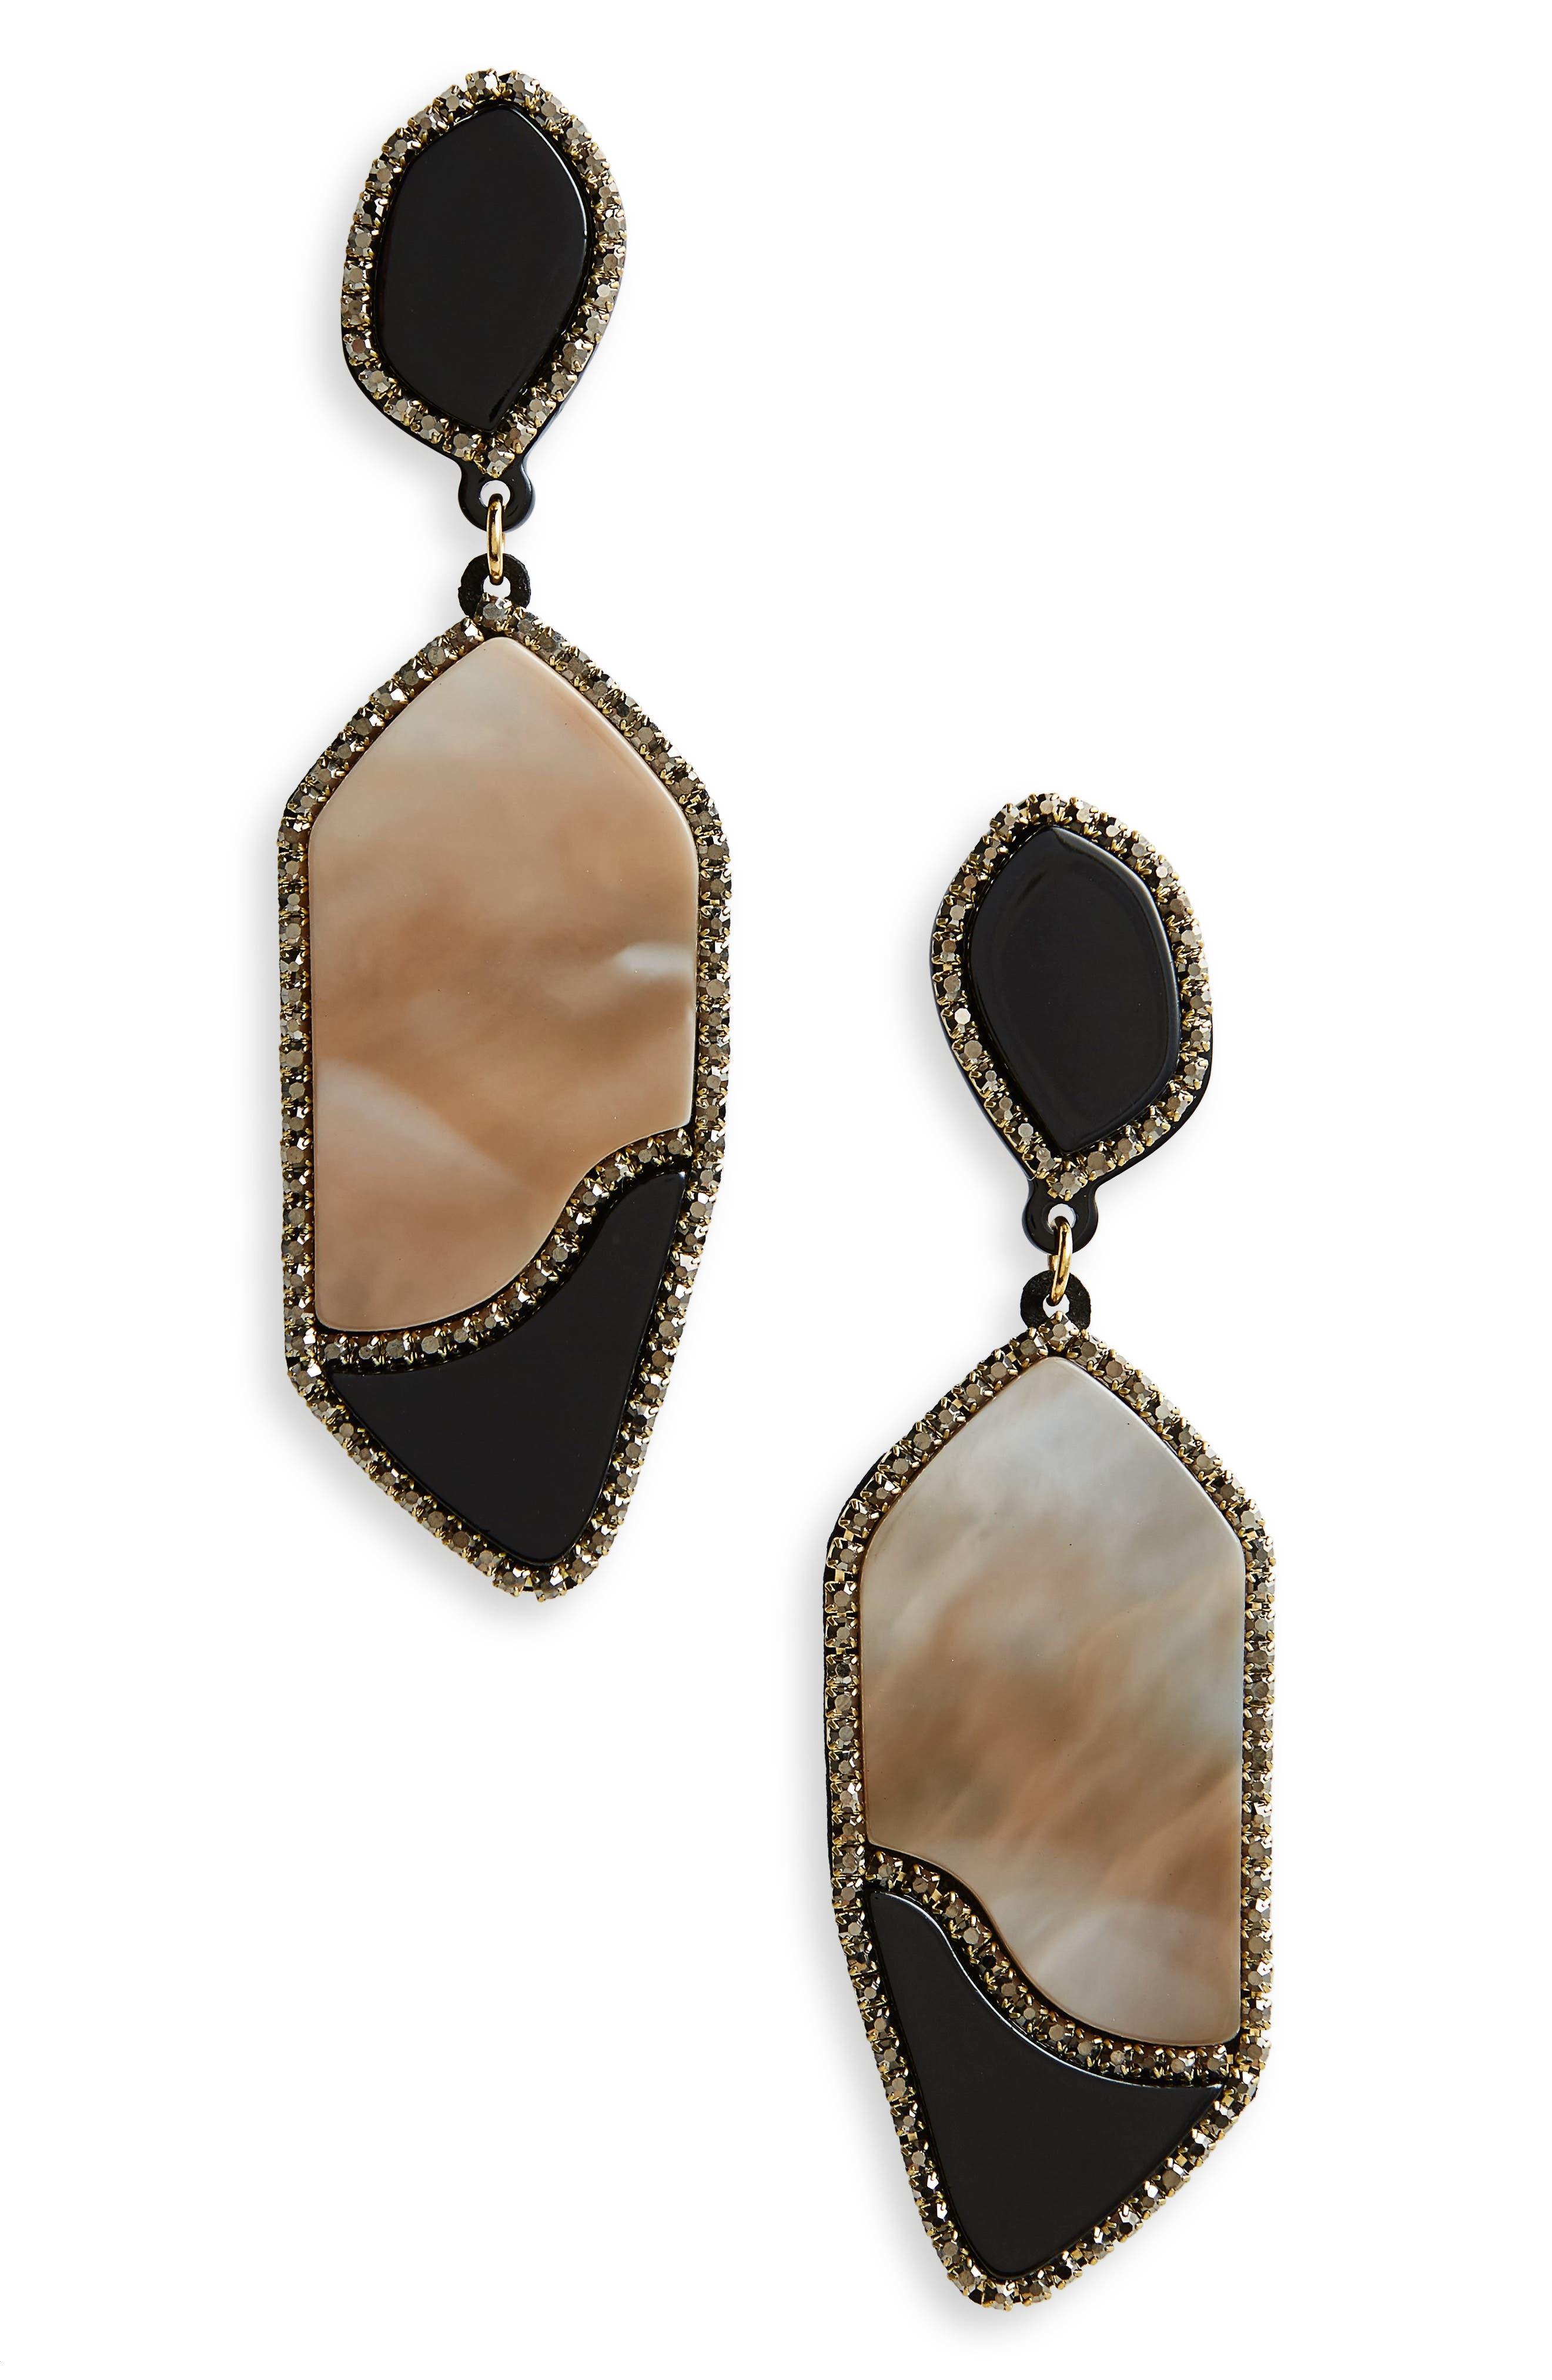 Resin Drop Earrings,                         Main,                         color, Black/ White